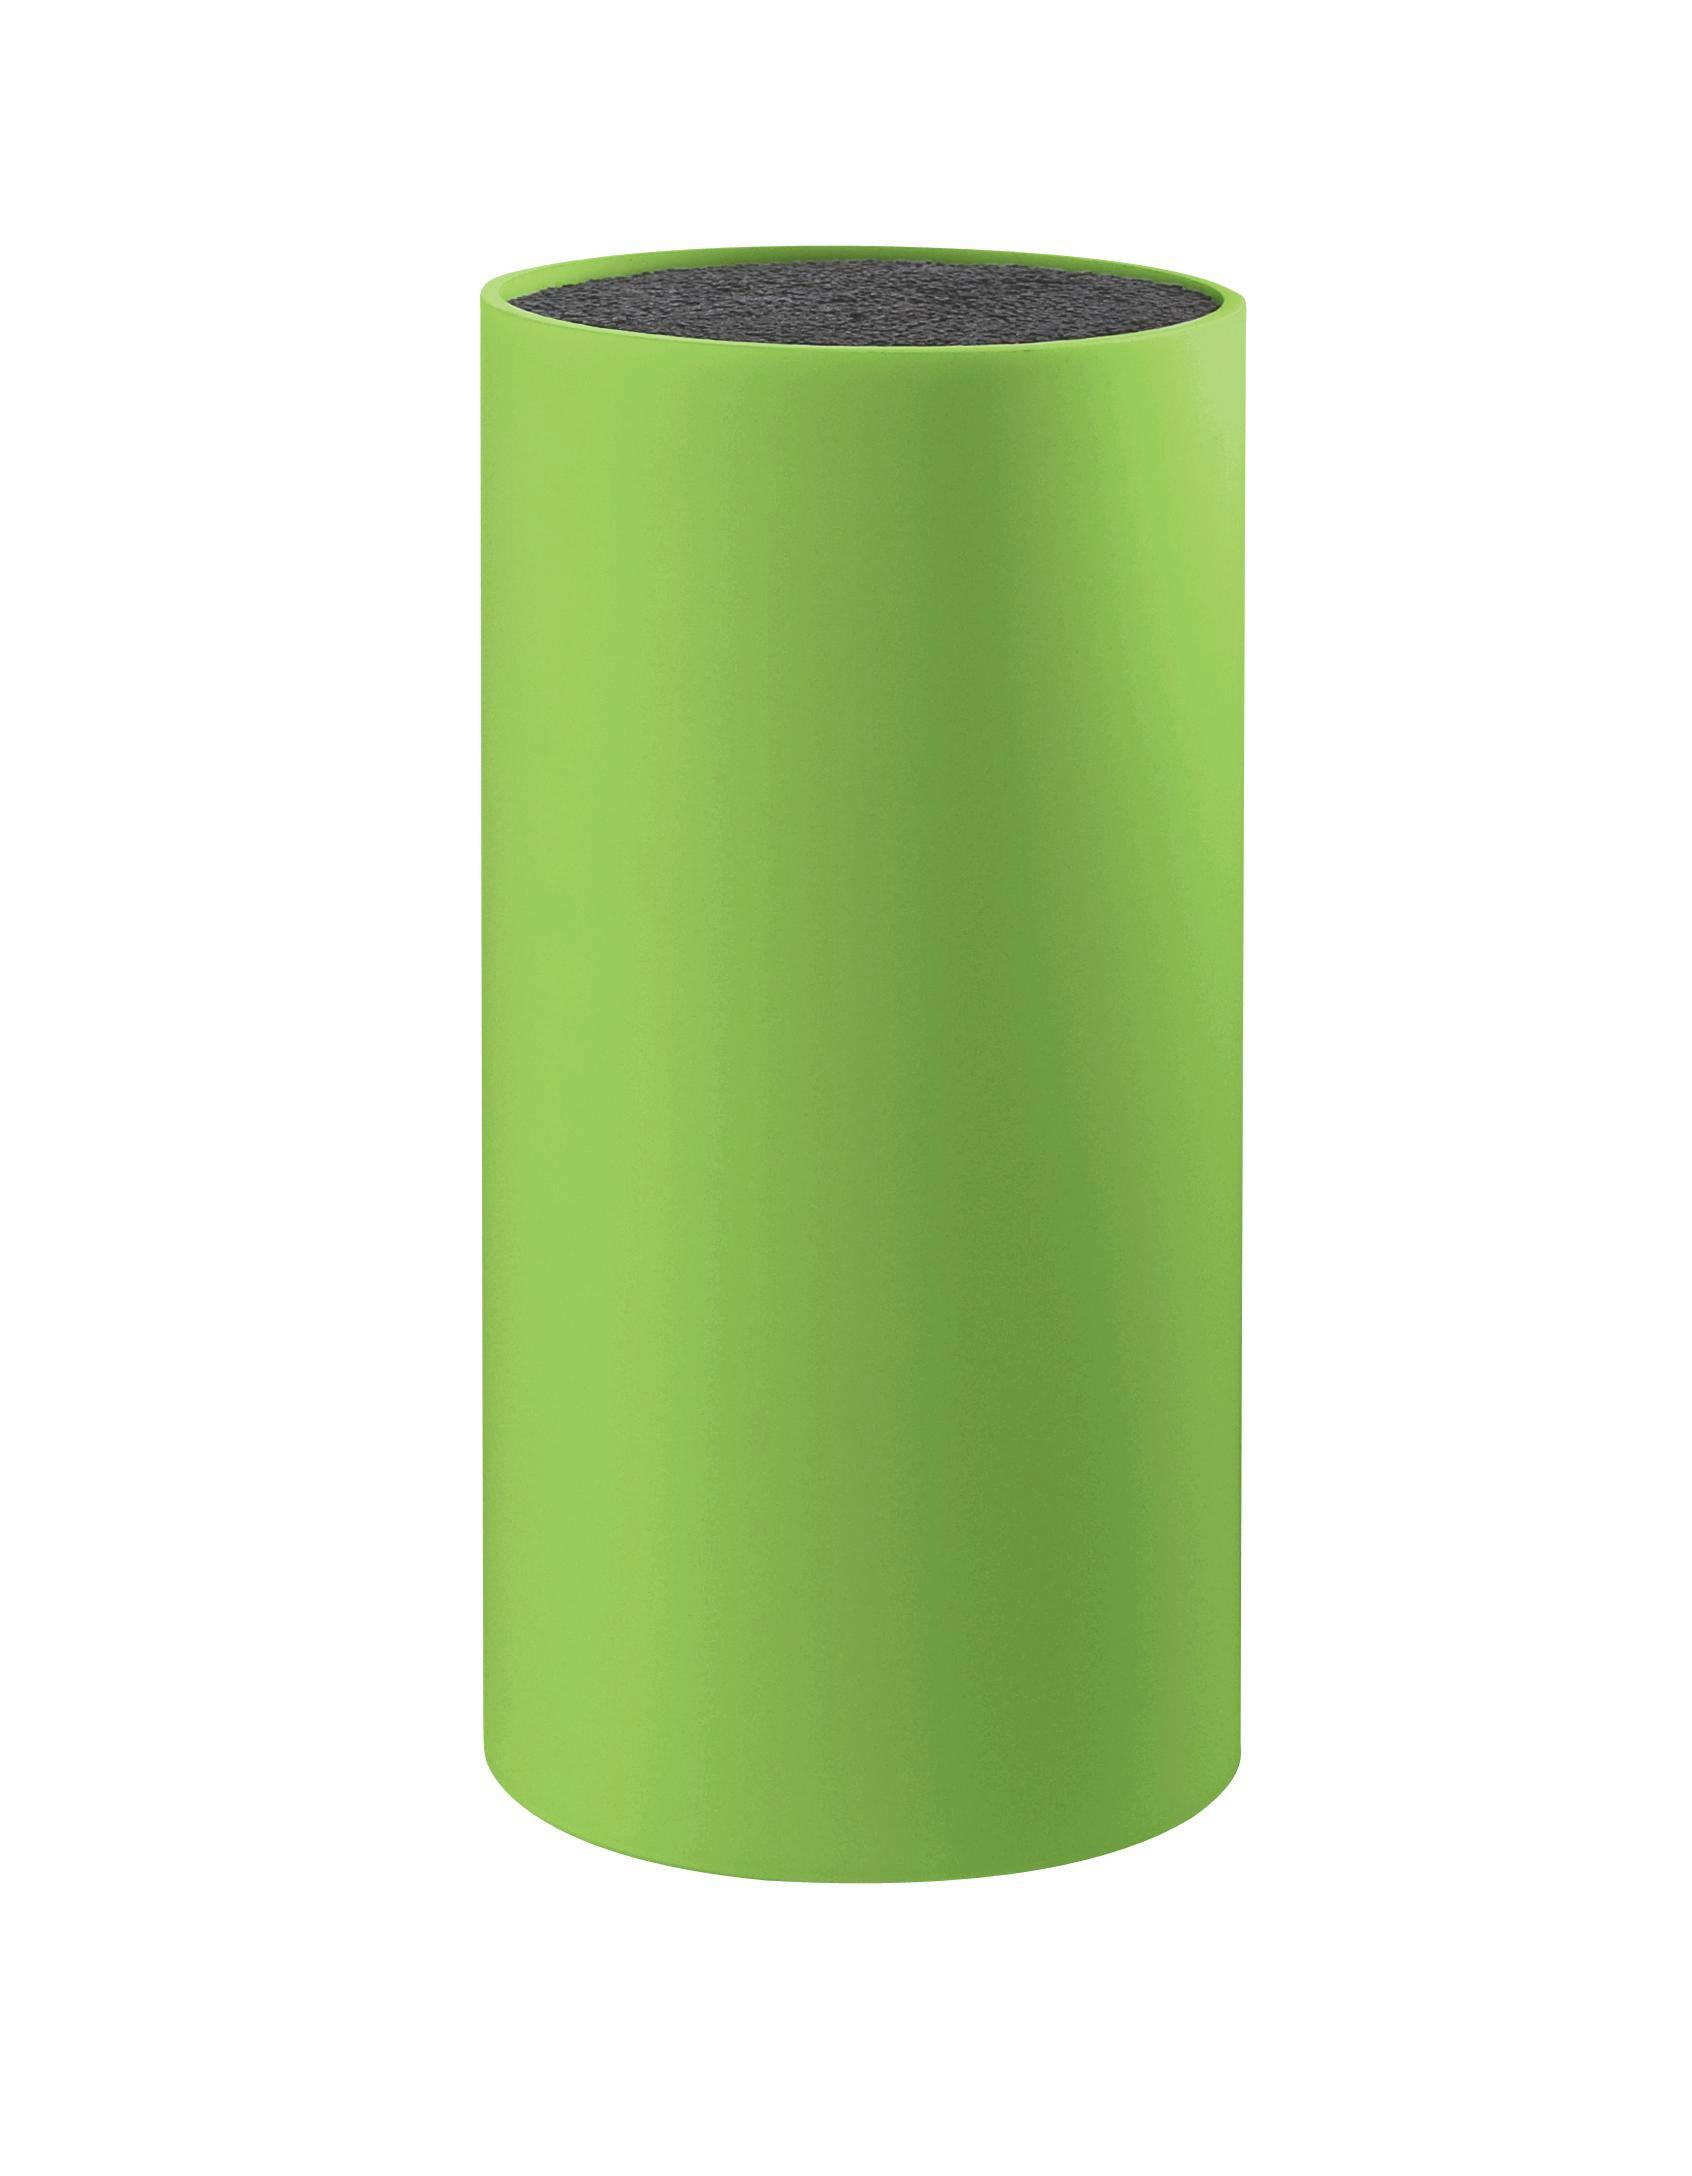 Blok Za Nože Thorsten - zelena, Konvencionalno, umetna masa (11/11/22.5cm) - MÖMAX modern living